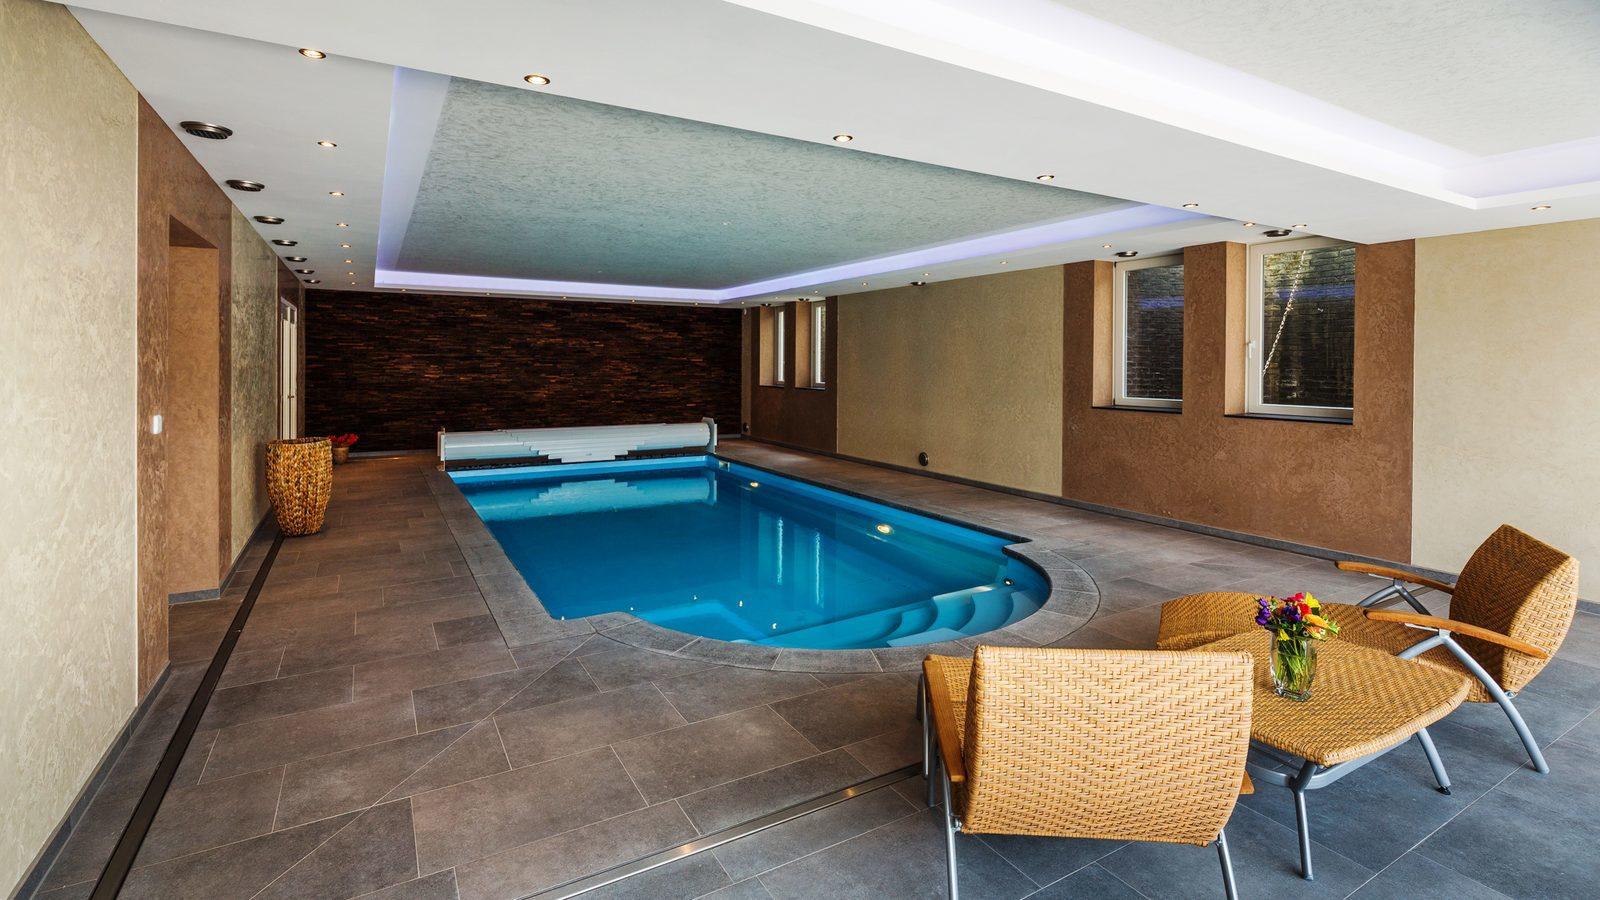 Nederland, Limburg, Schweiberg, luxe, vakantievilla, wellness, zwembad, sauna, weekendje weg